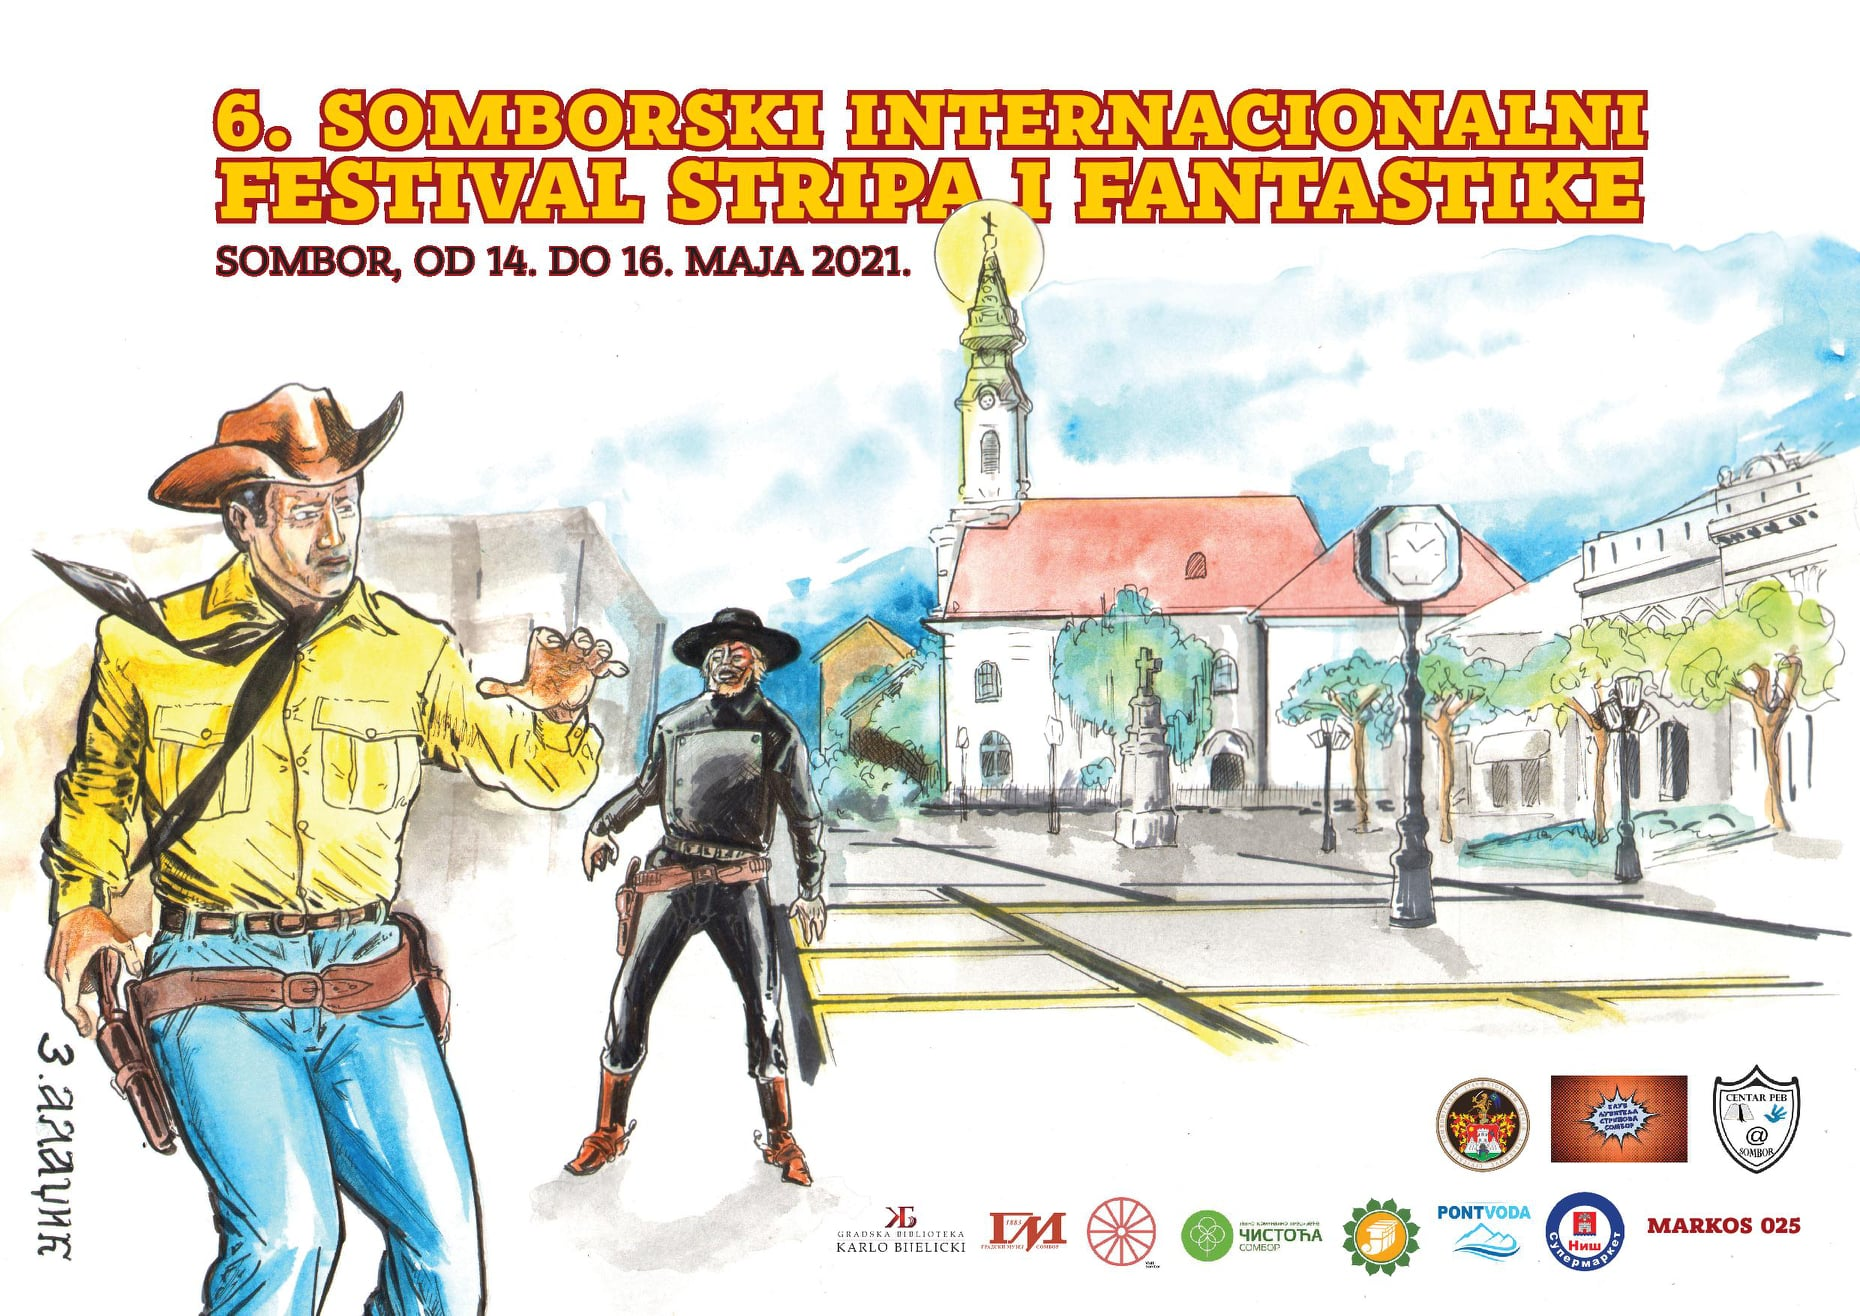 plakat-6-somborski-internacionalni-festival-stripa-i-fantastike-2021-sombor